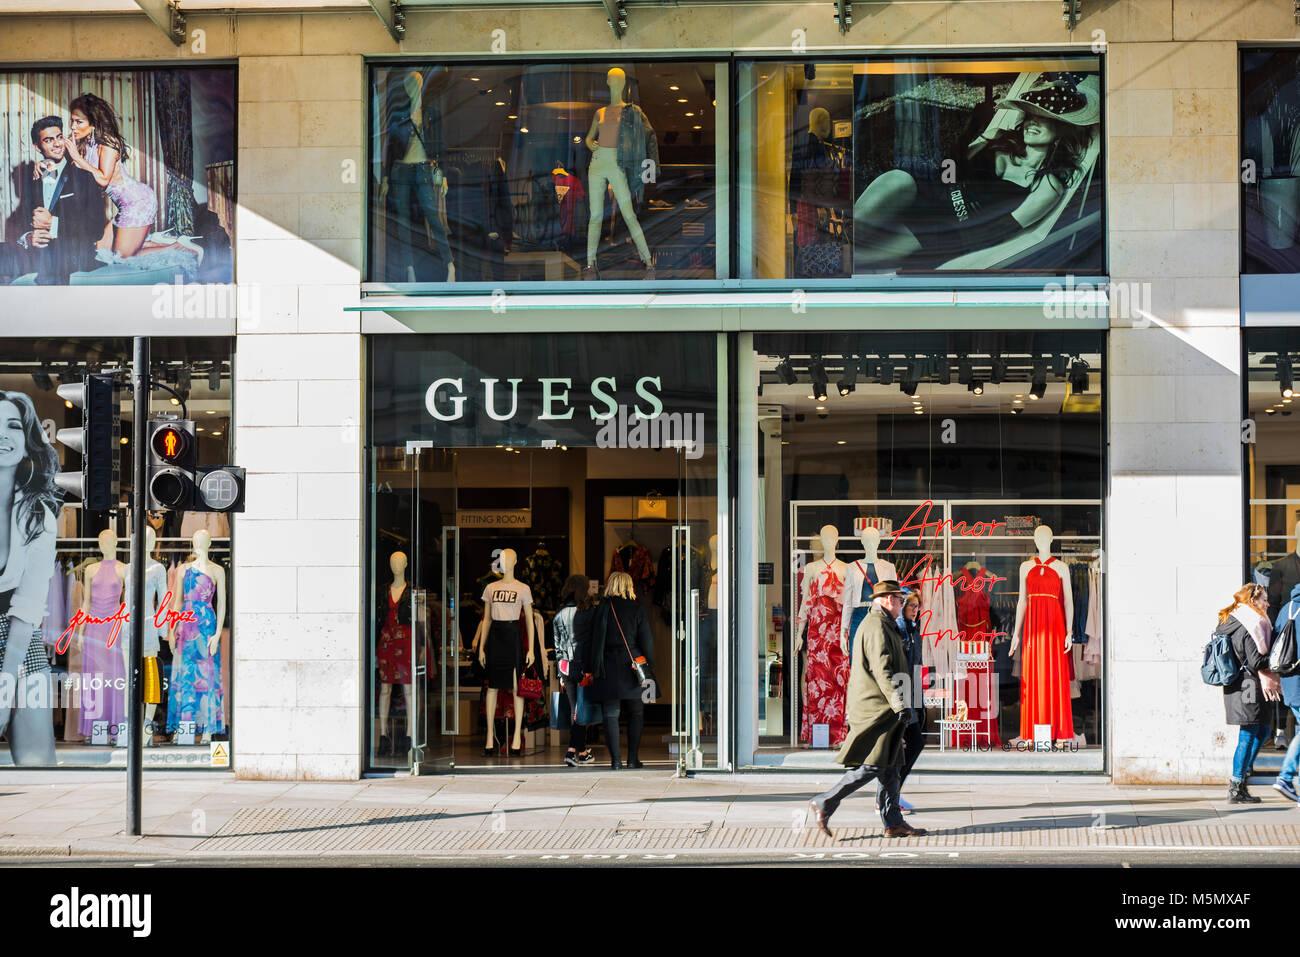 Guess Shop Immagini e Fotos Stock Alamy